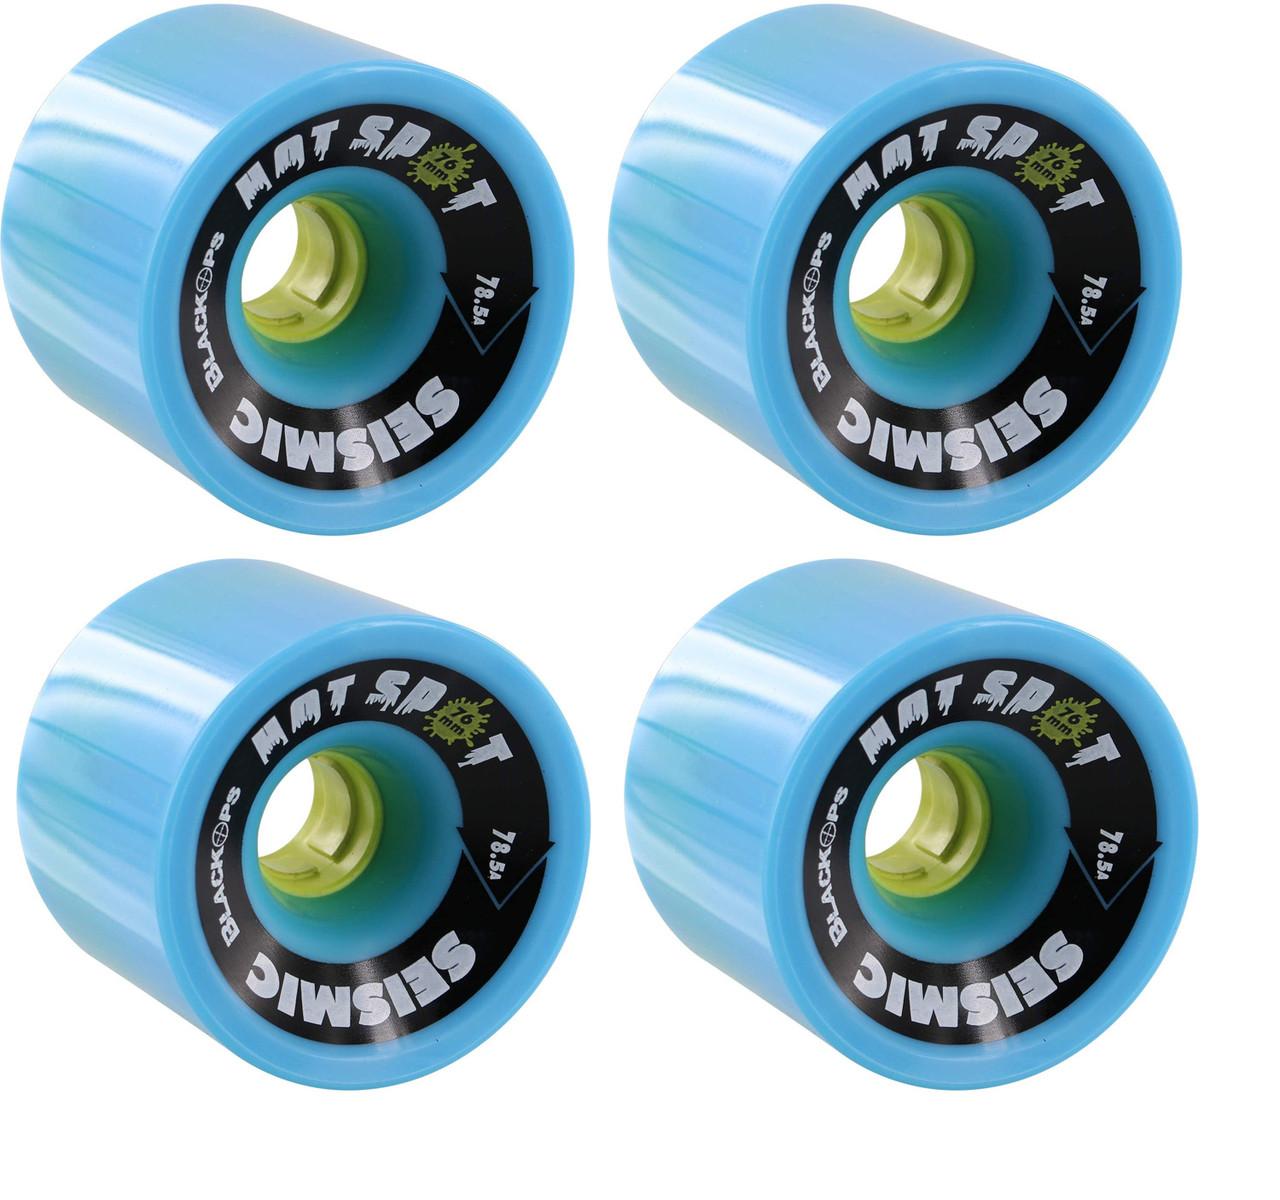 Seismic Longboard Wheels Hot Spot Blue 76mm x 59mm 81.5A Set of 4